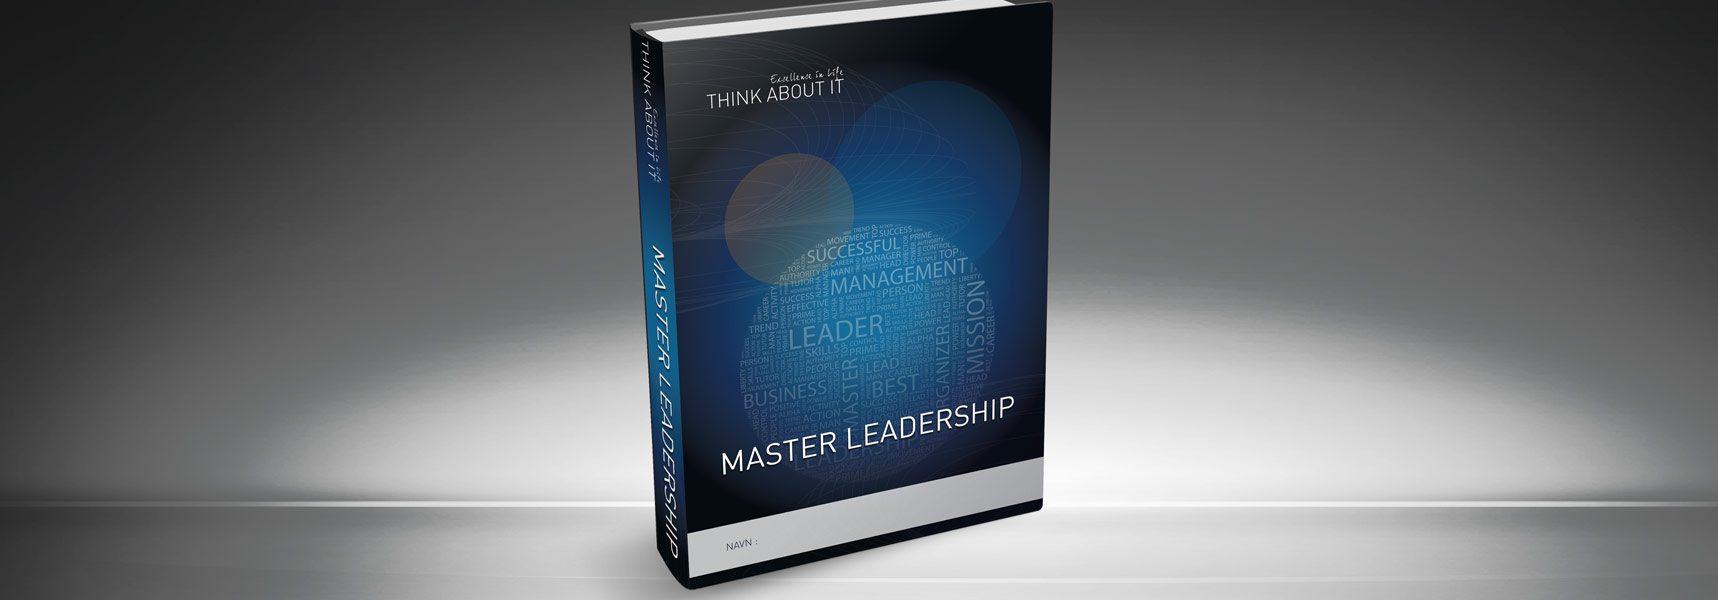 thinkaboutit-masterleadership